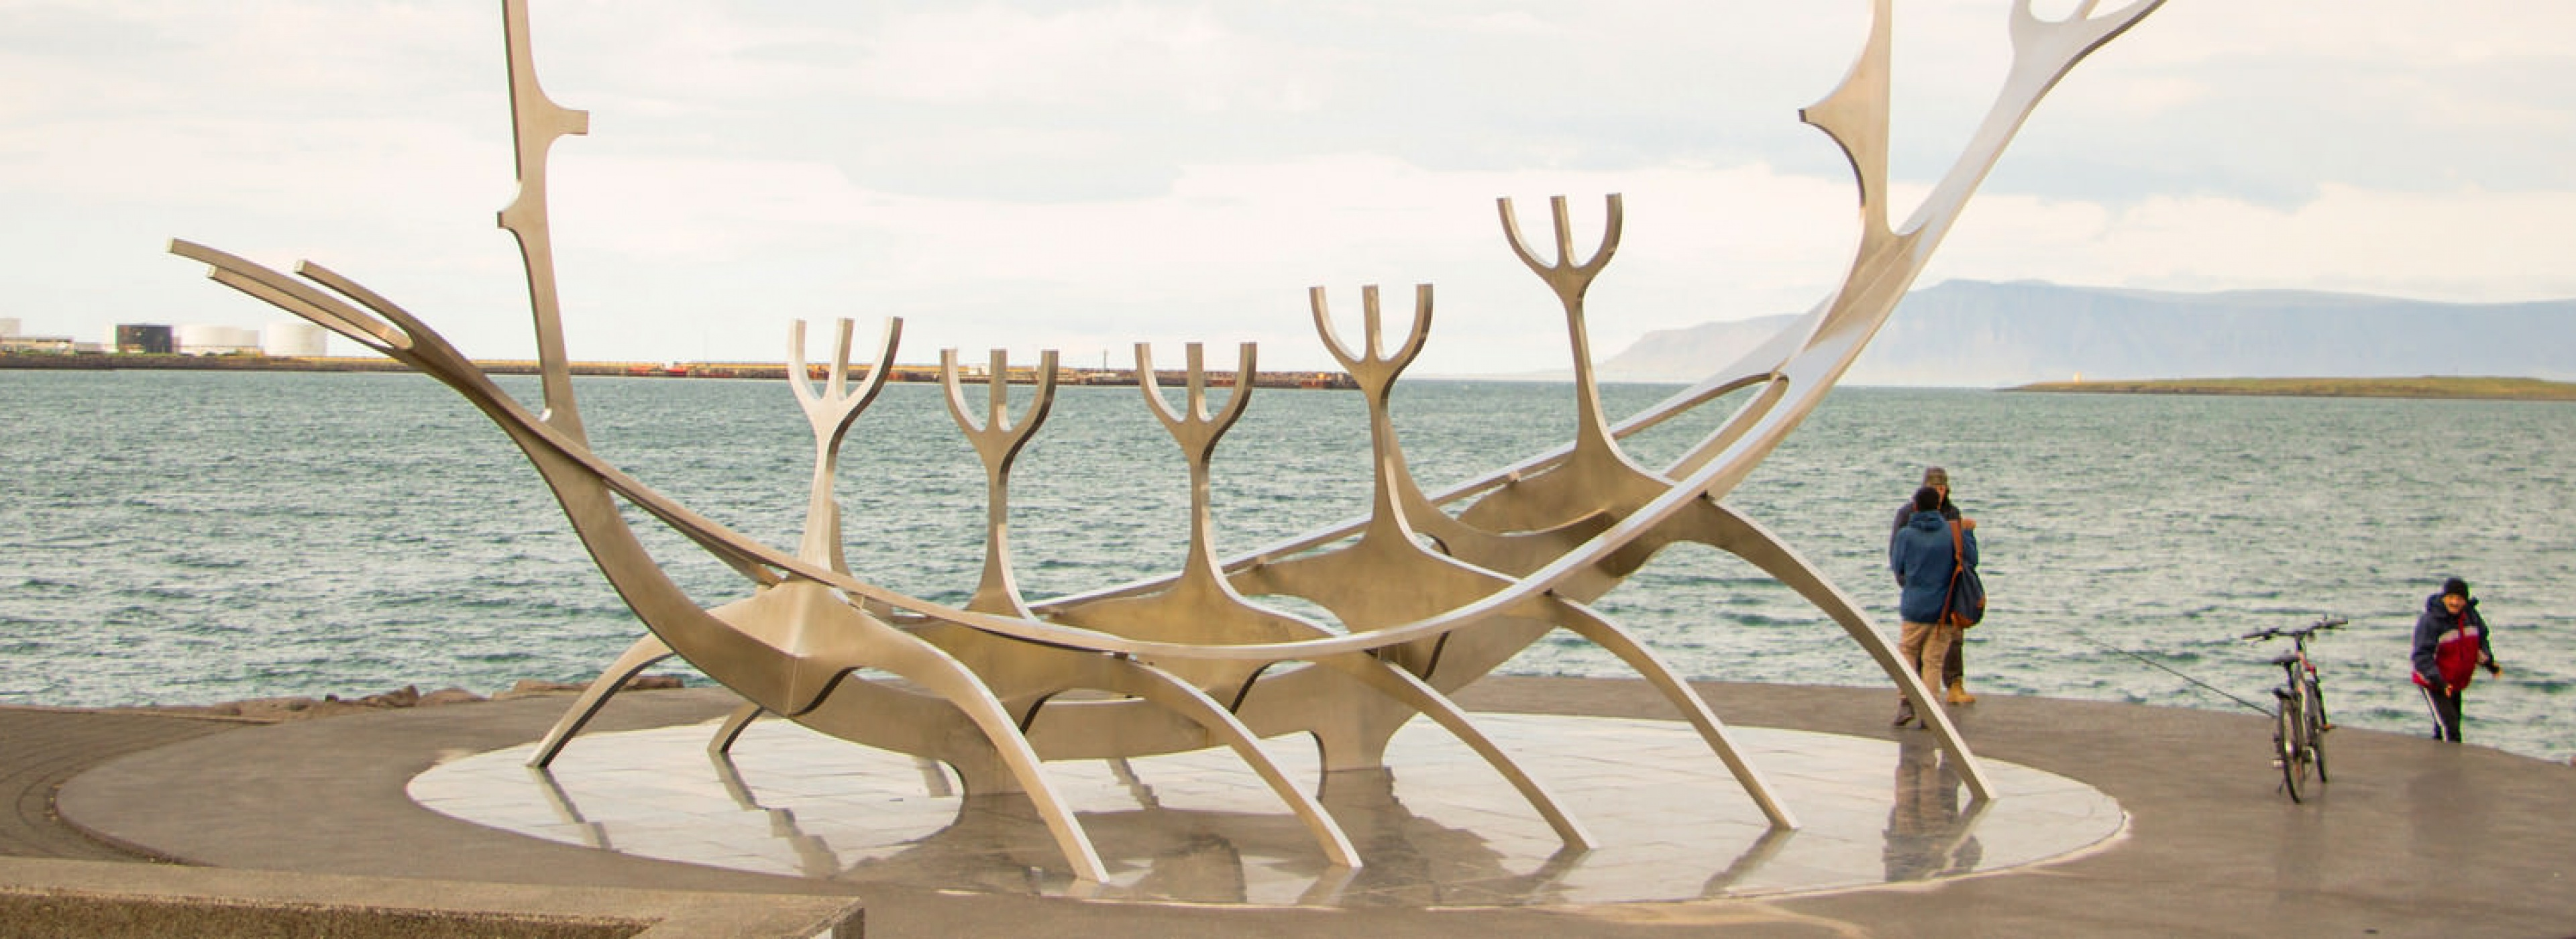 Explore the most famous Reykjavik landmarks, including the striking Sun Voyager sculpture